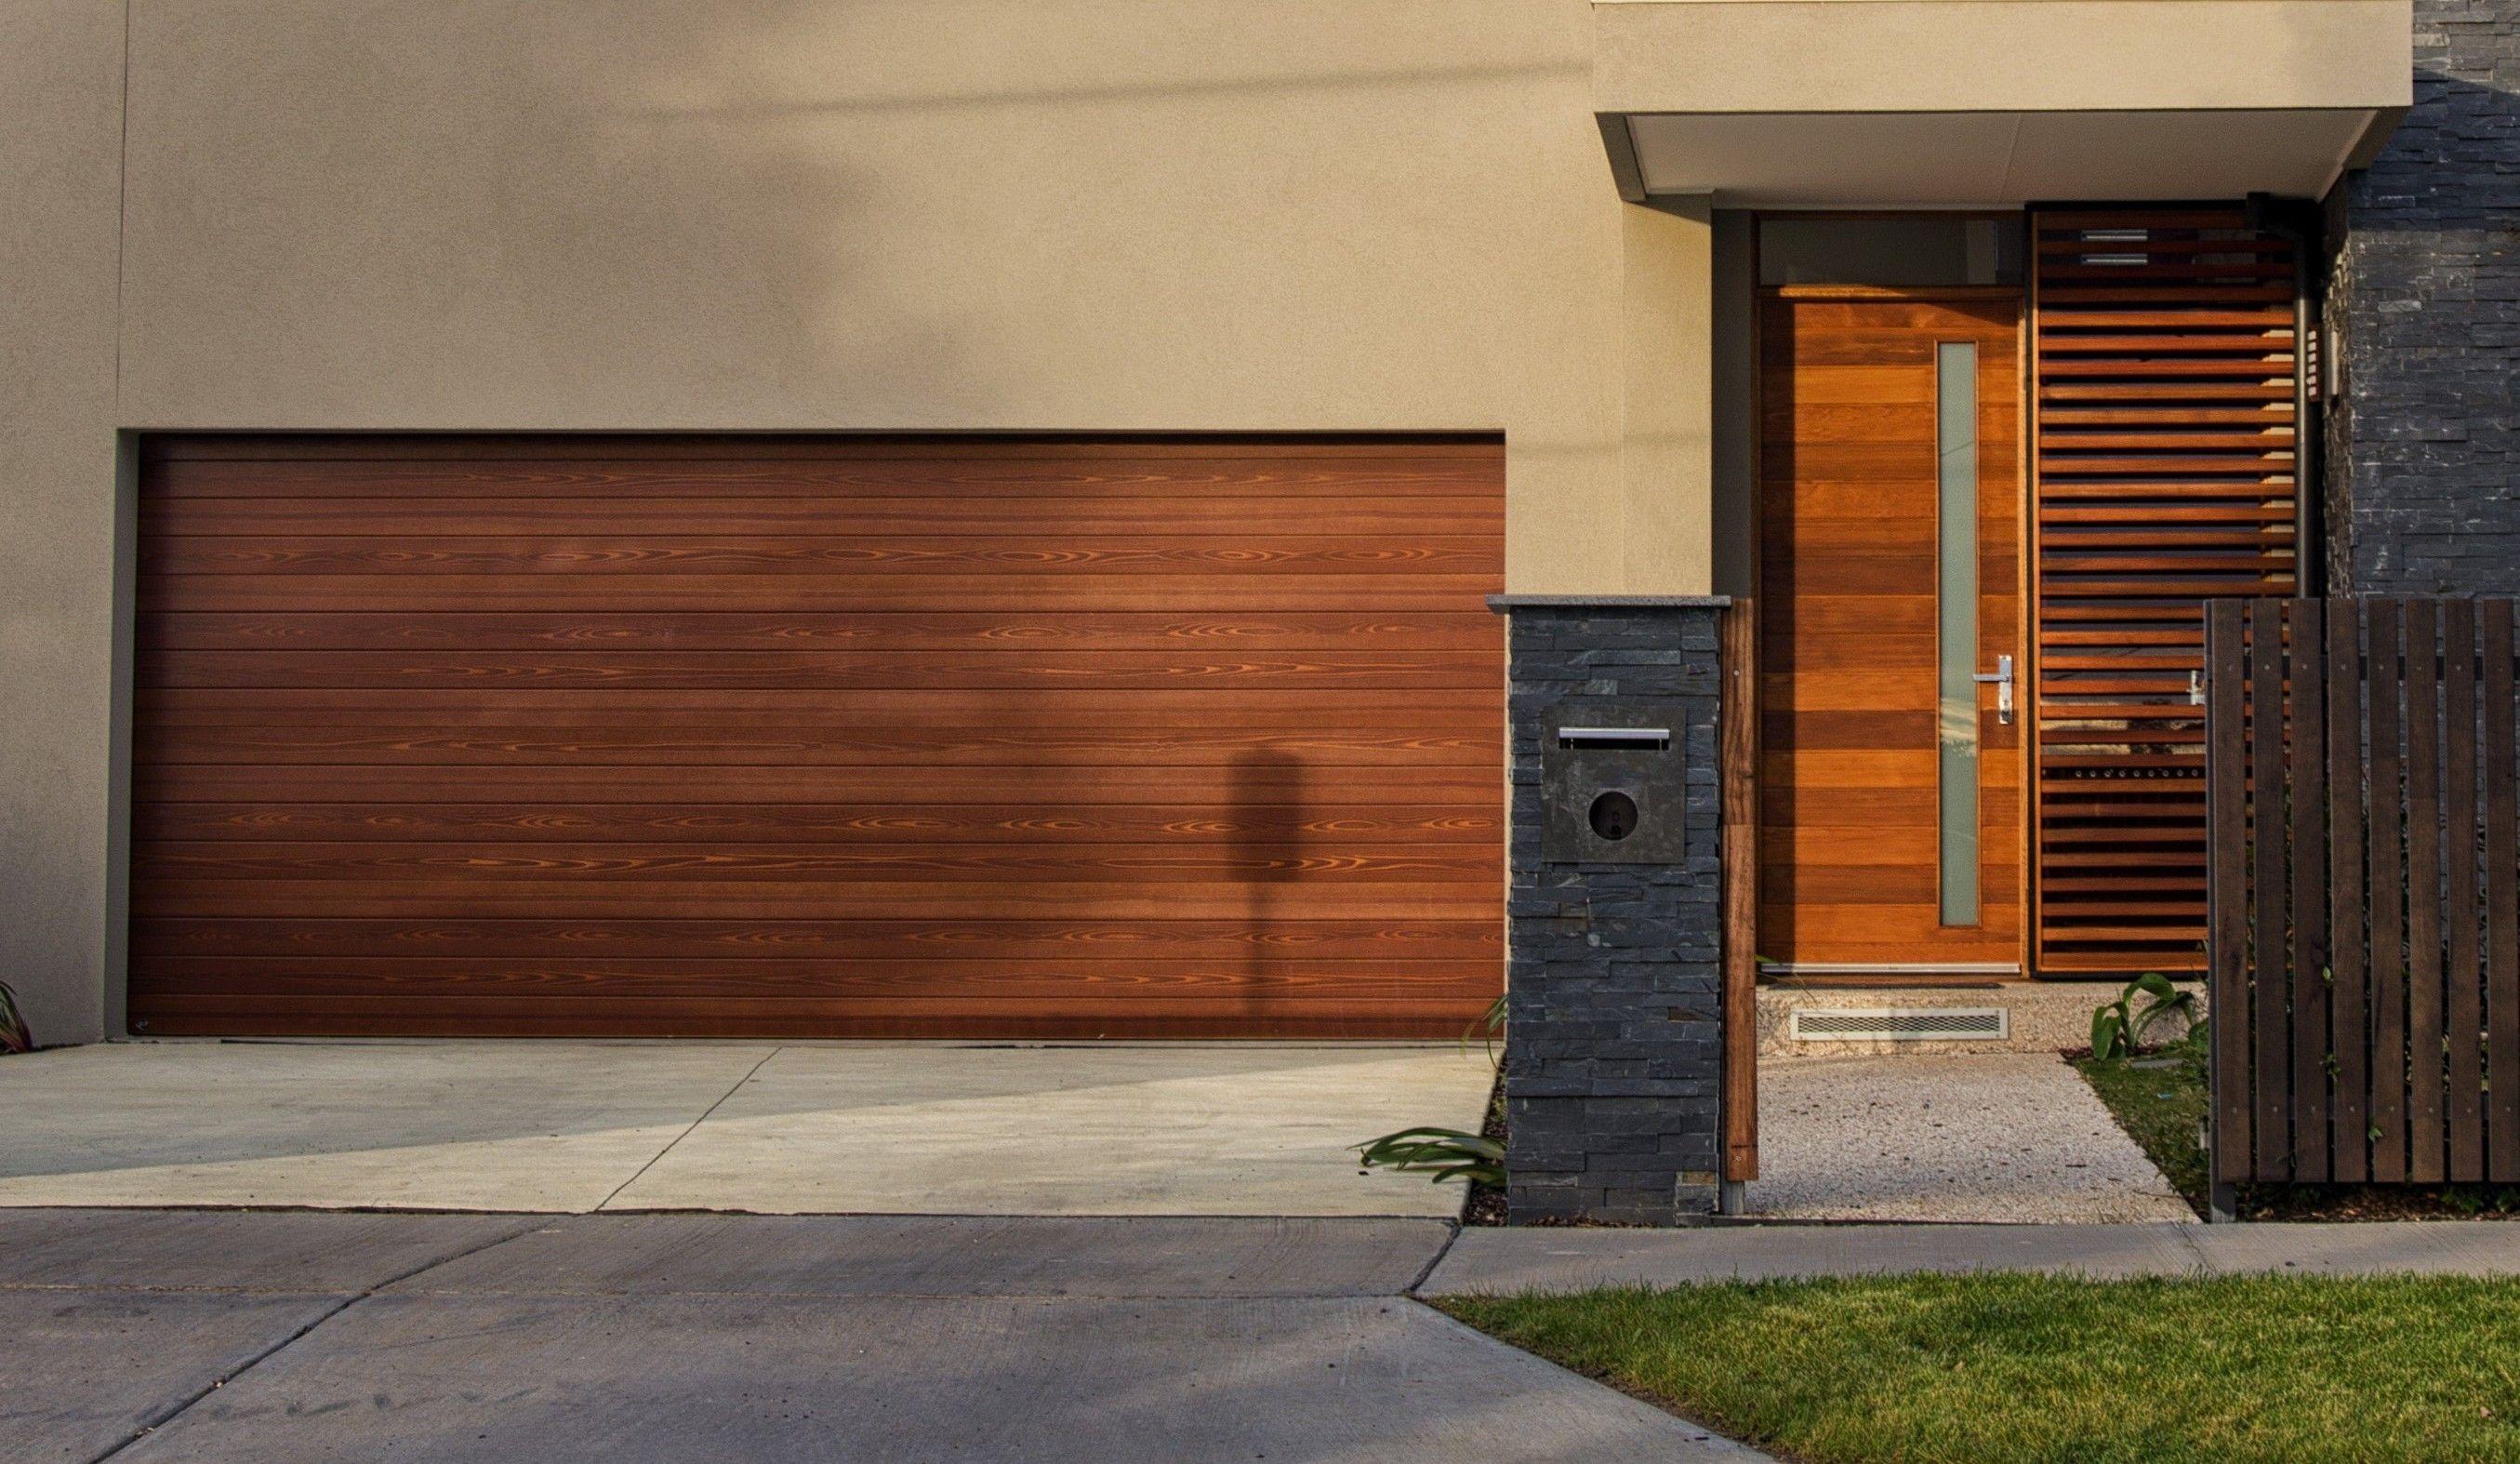 Garage Doorswonderful Woodenrage Door Photo Design Awesome Wood